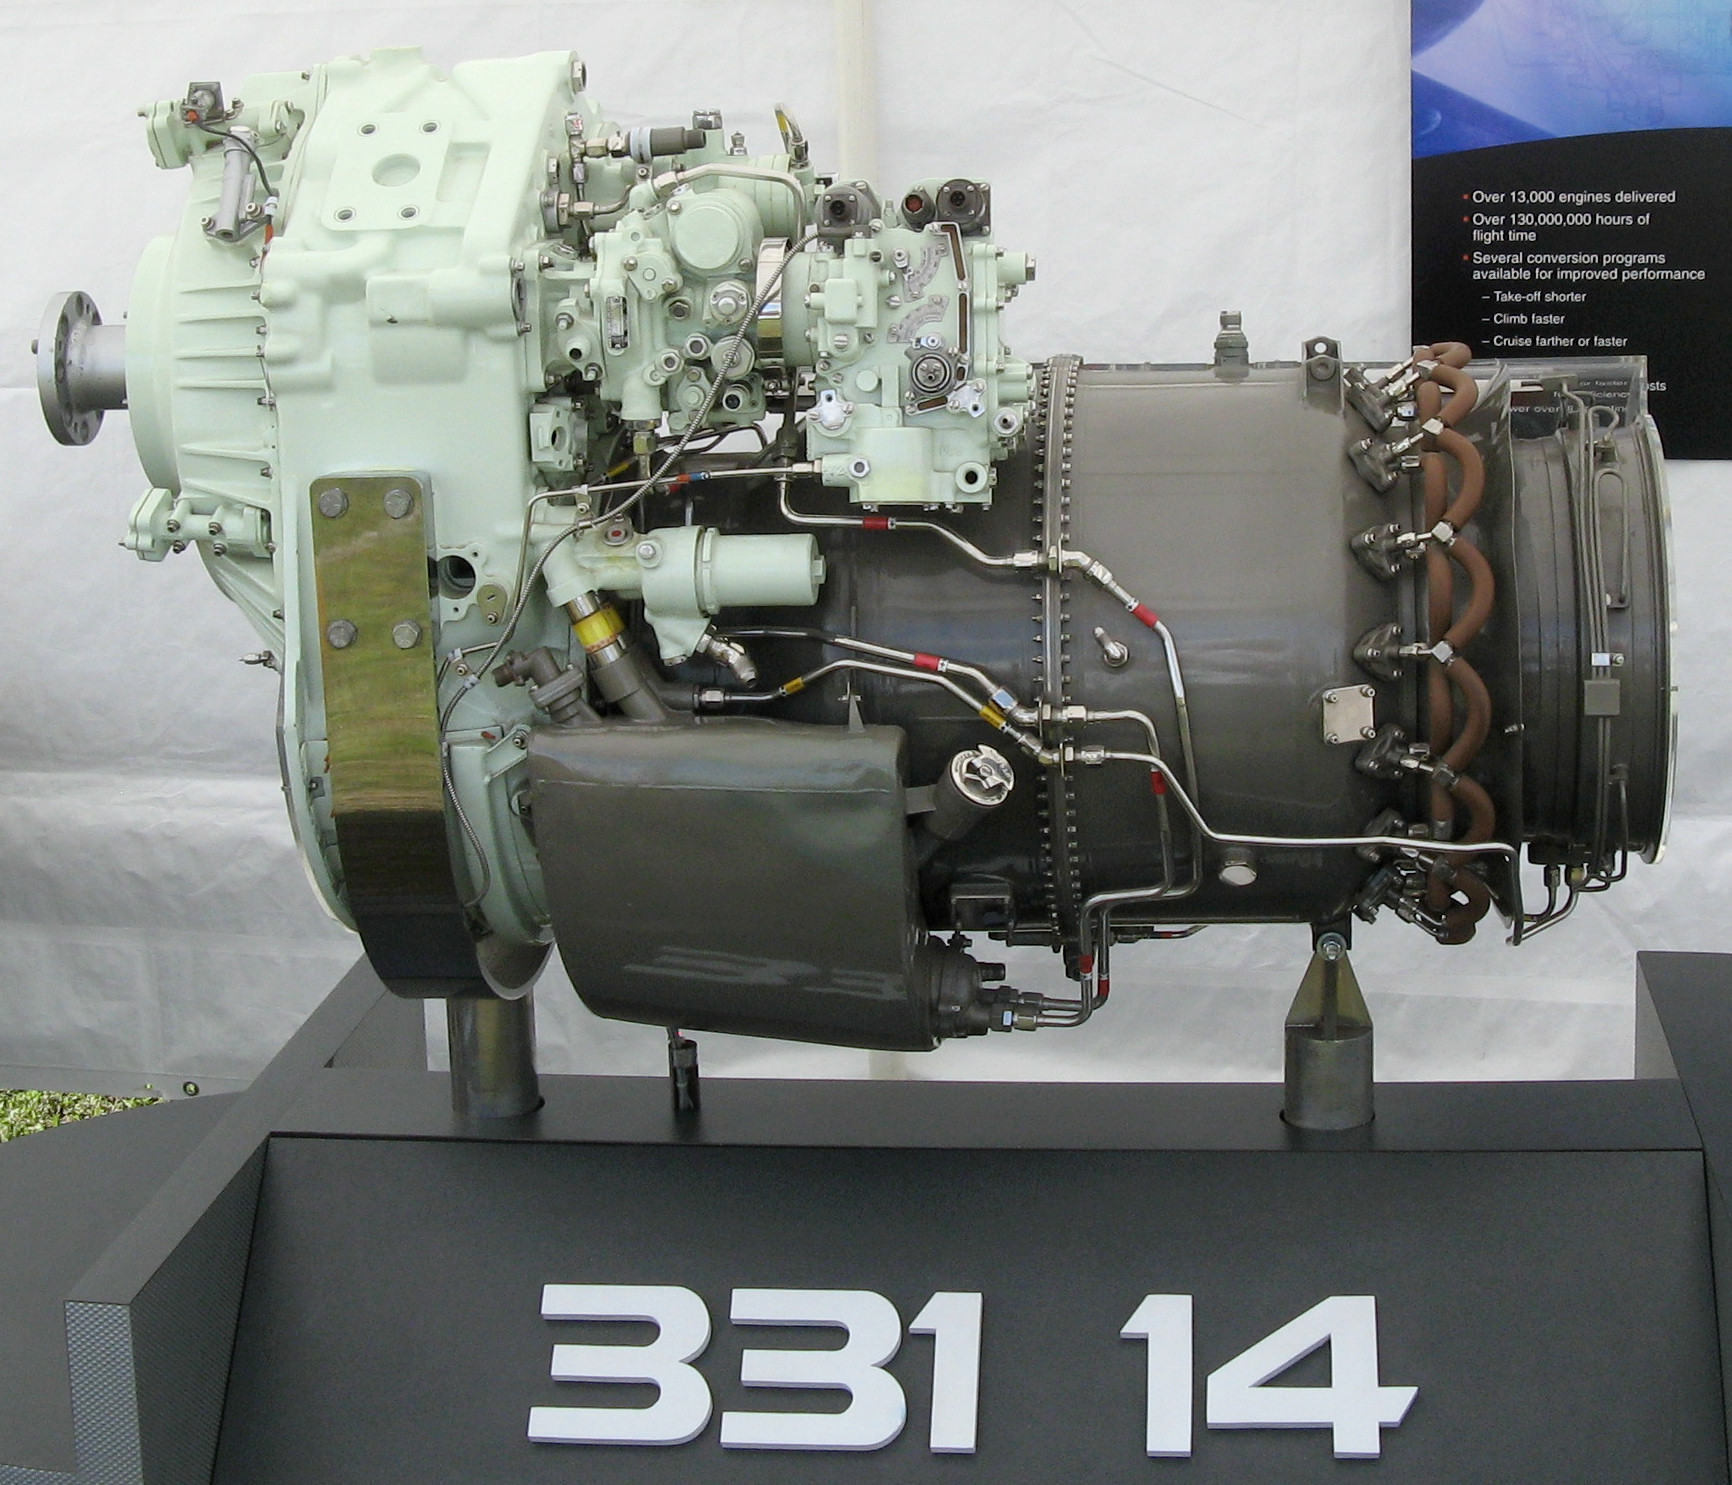 Honeywell TPE331 - Wikipedia